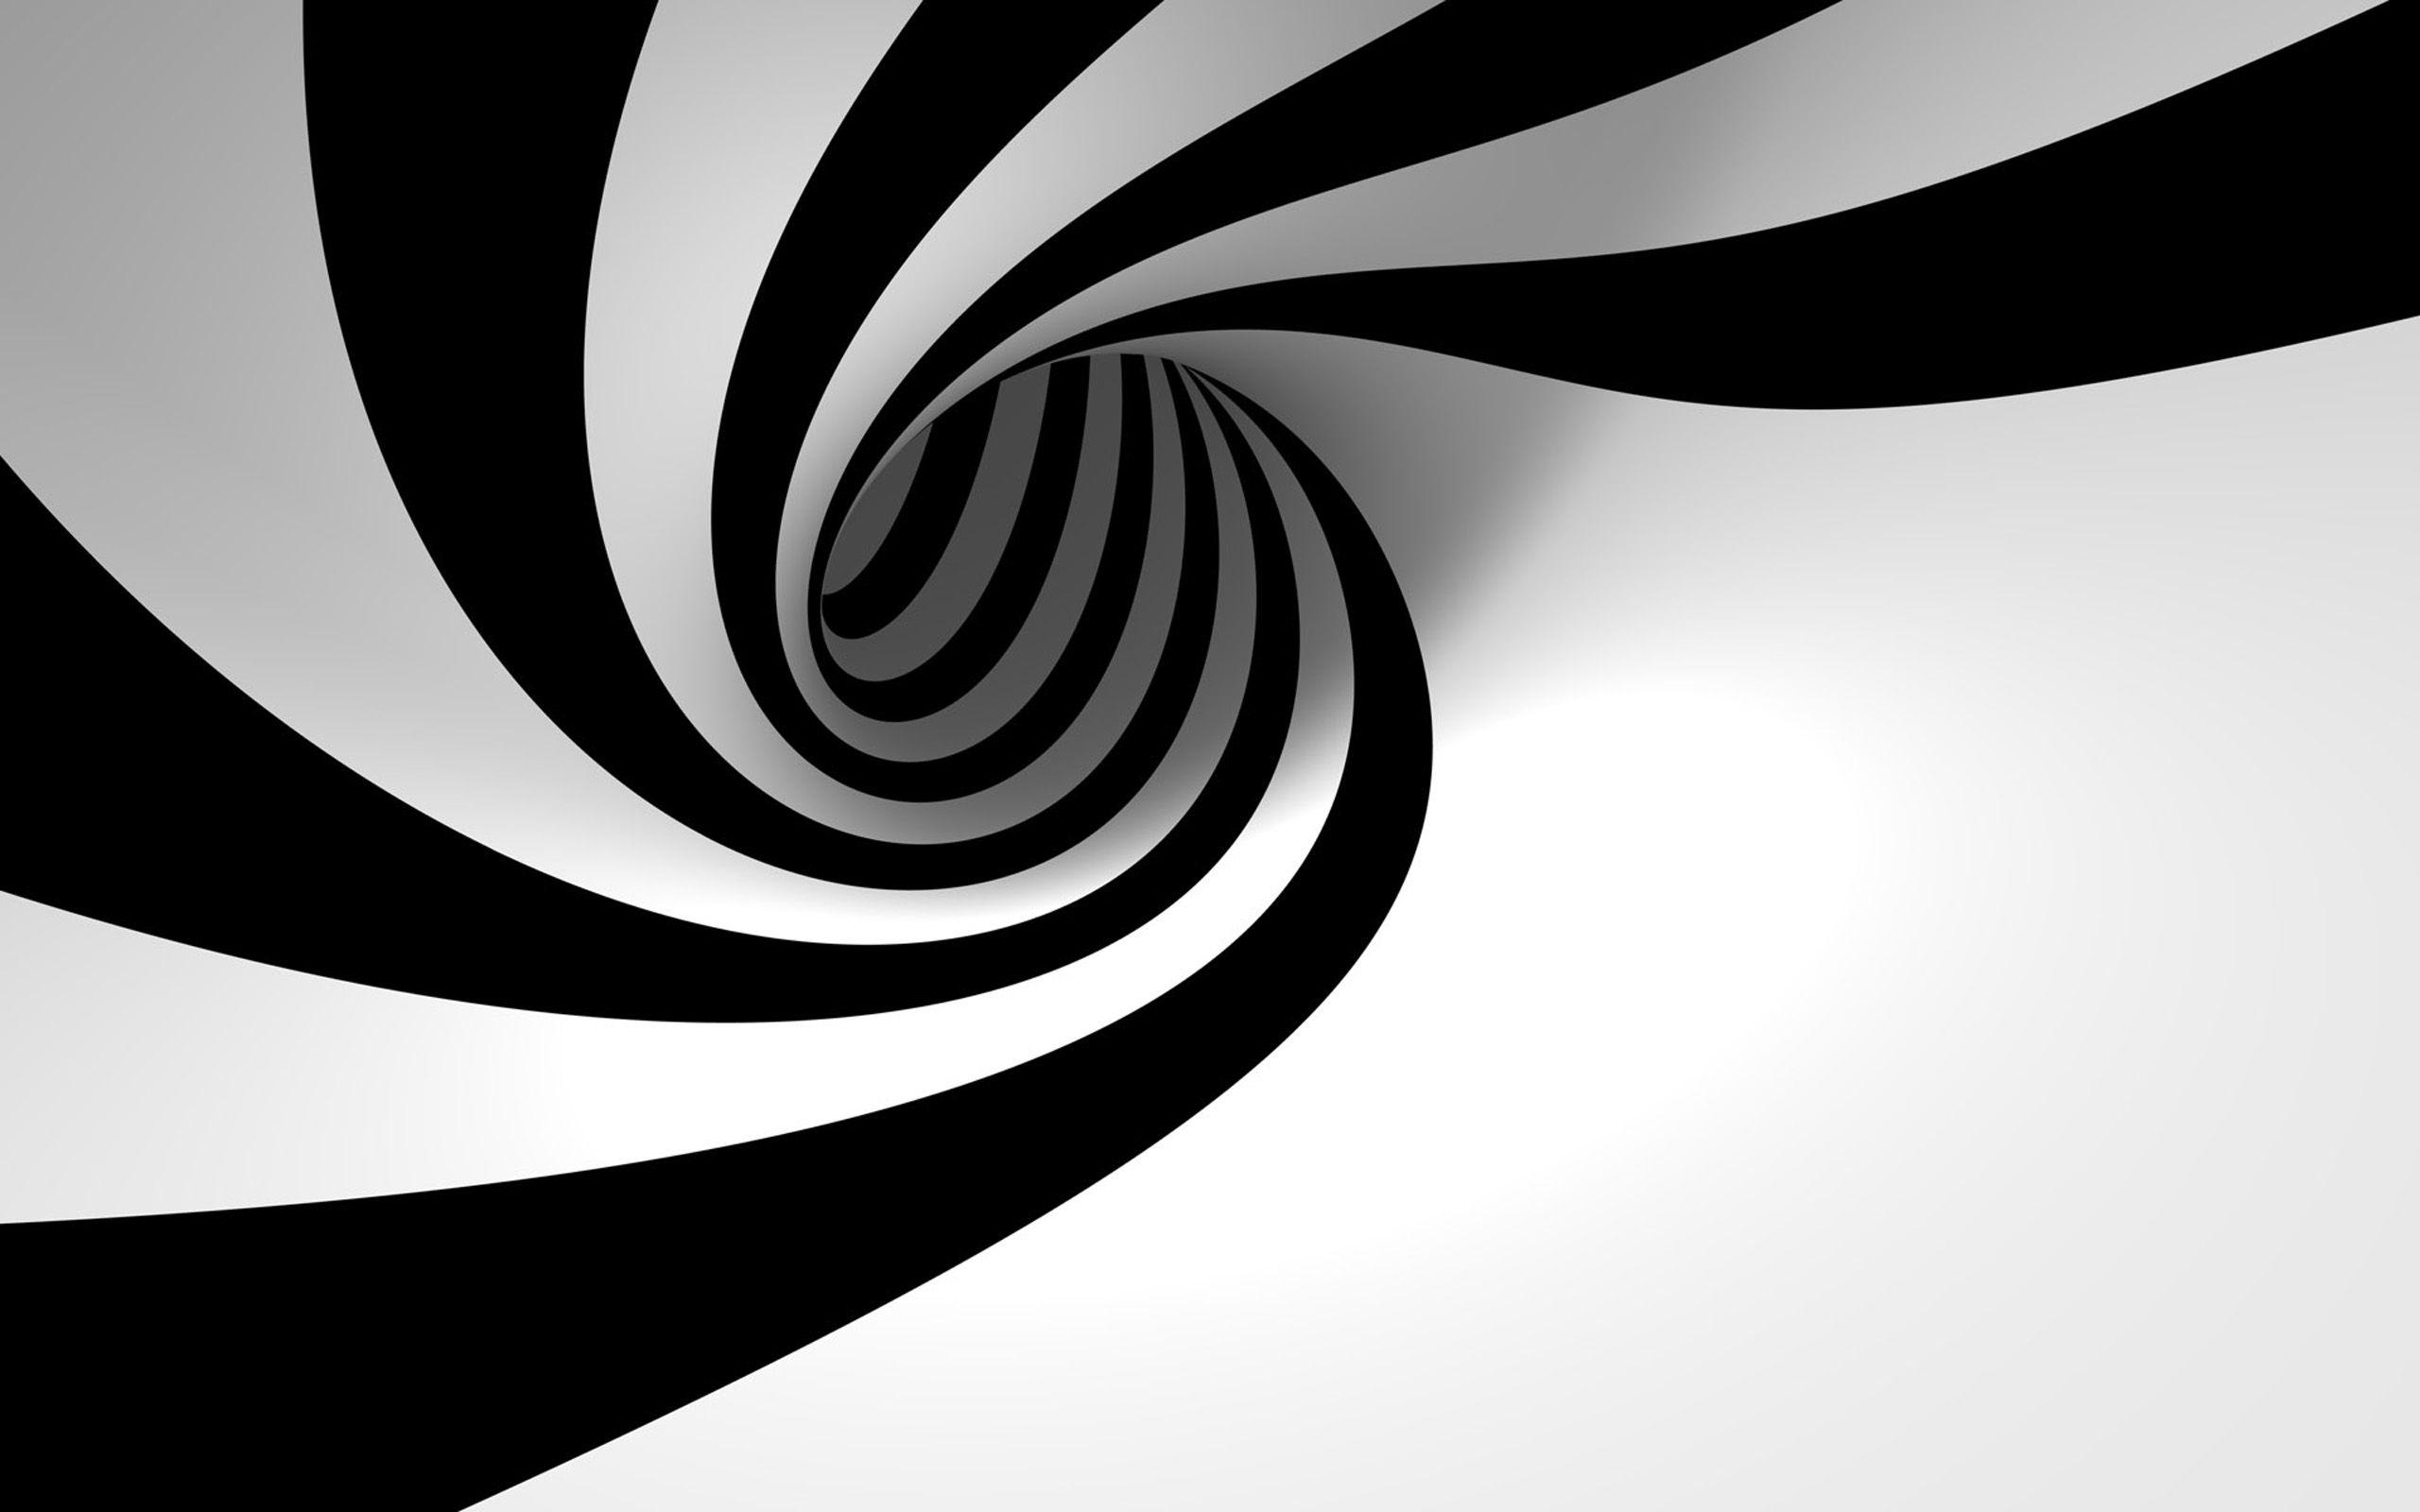 No Grey Area Black And White Background Black And White Abstract Black Abstract